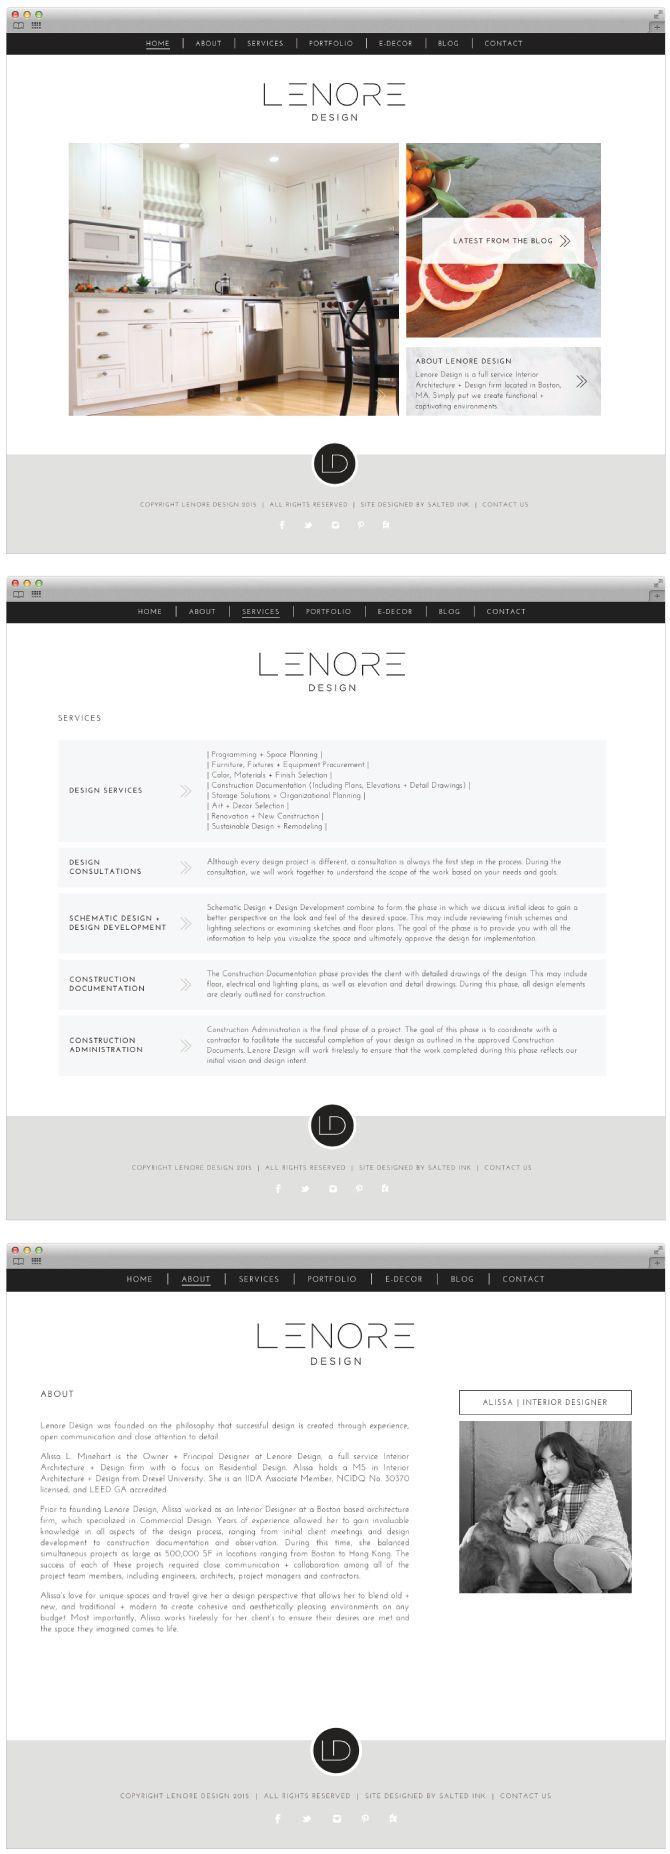 Brand Launch: Lenore Interior Design - Salted Ink Design Co.   CUSTOM WORDPRESS WEBSITE DESIGN   wordpress, website, design, branding, custom   www.saltedink.com